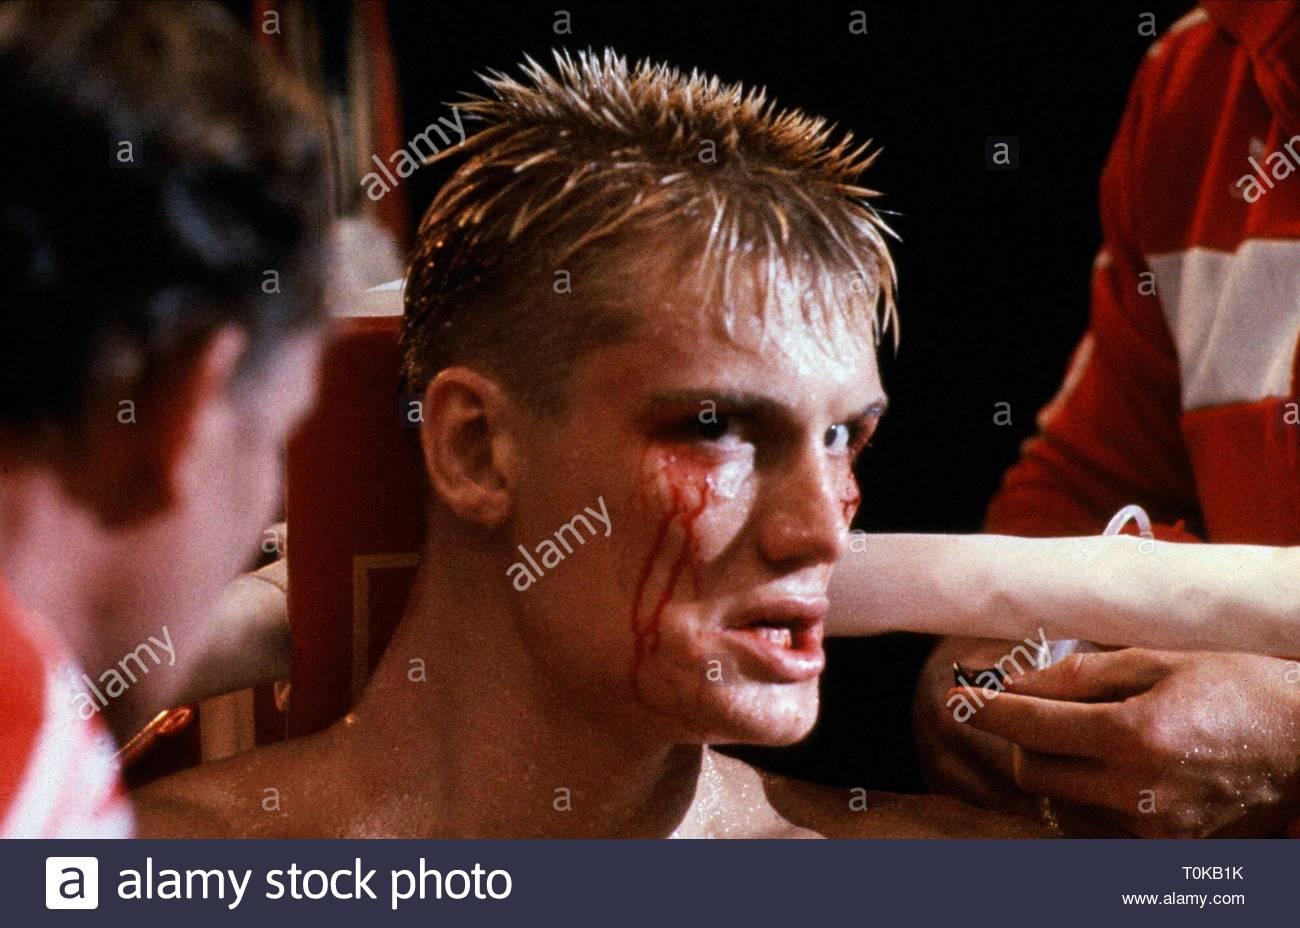 DOLPH LUNDGREN, ROCKY IV, 1985 - Stock Image